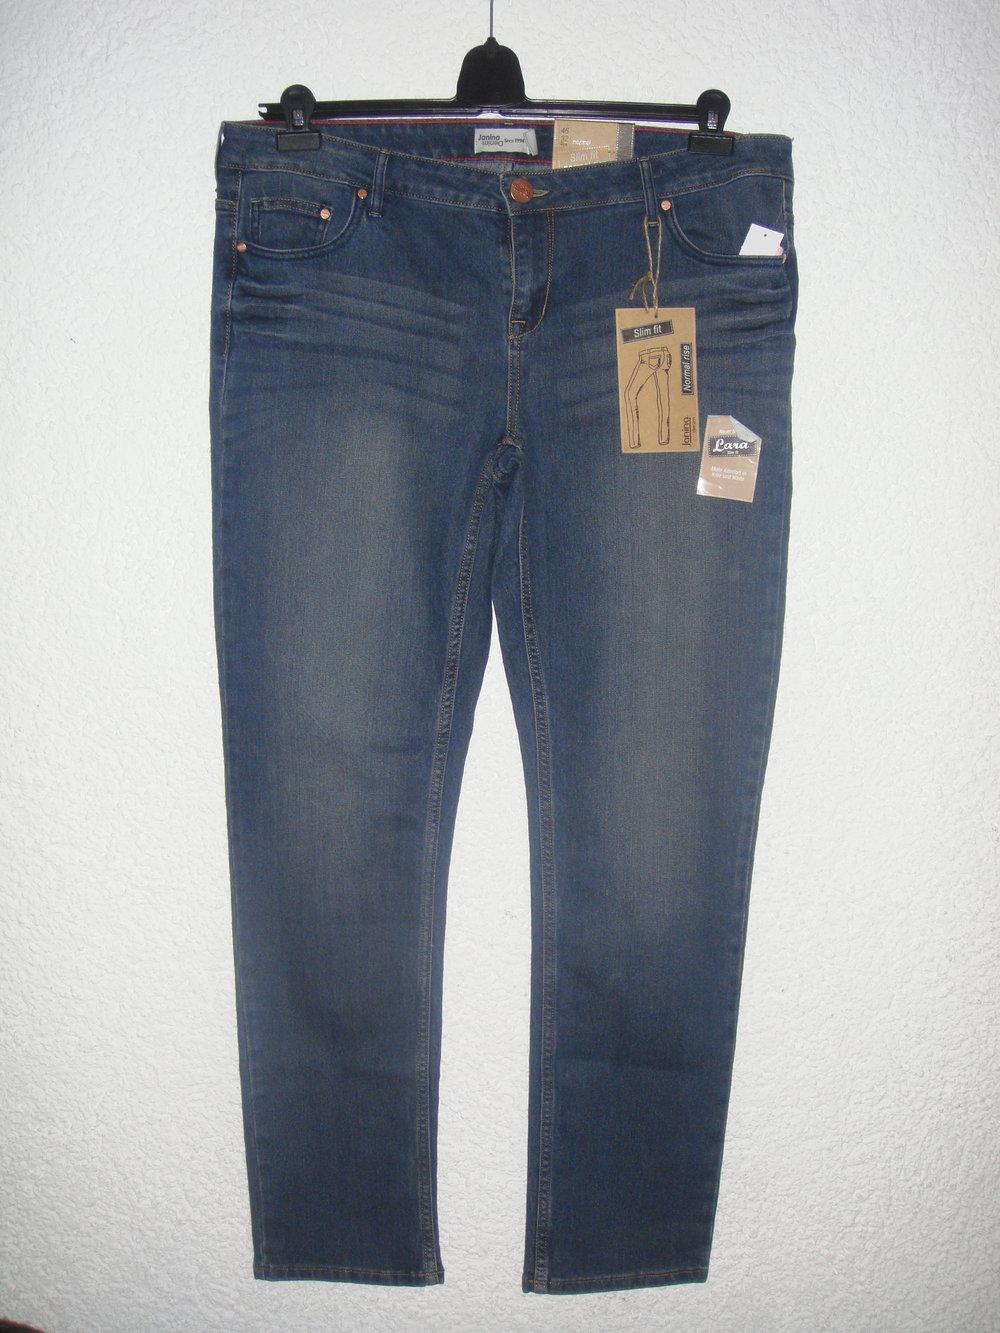 jeans jeanshose janina denim neu mit etikett. Black Bedroom Furniture Sets. Home Design Ideas